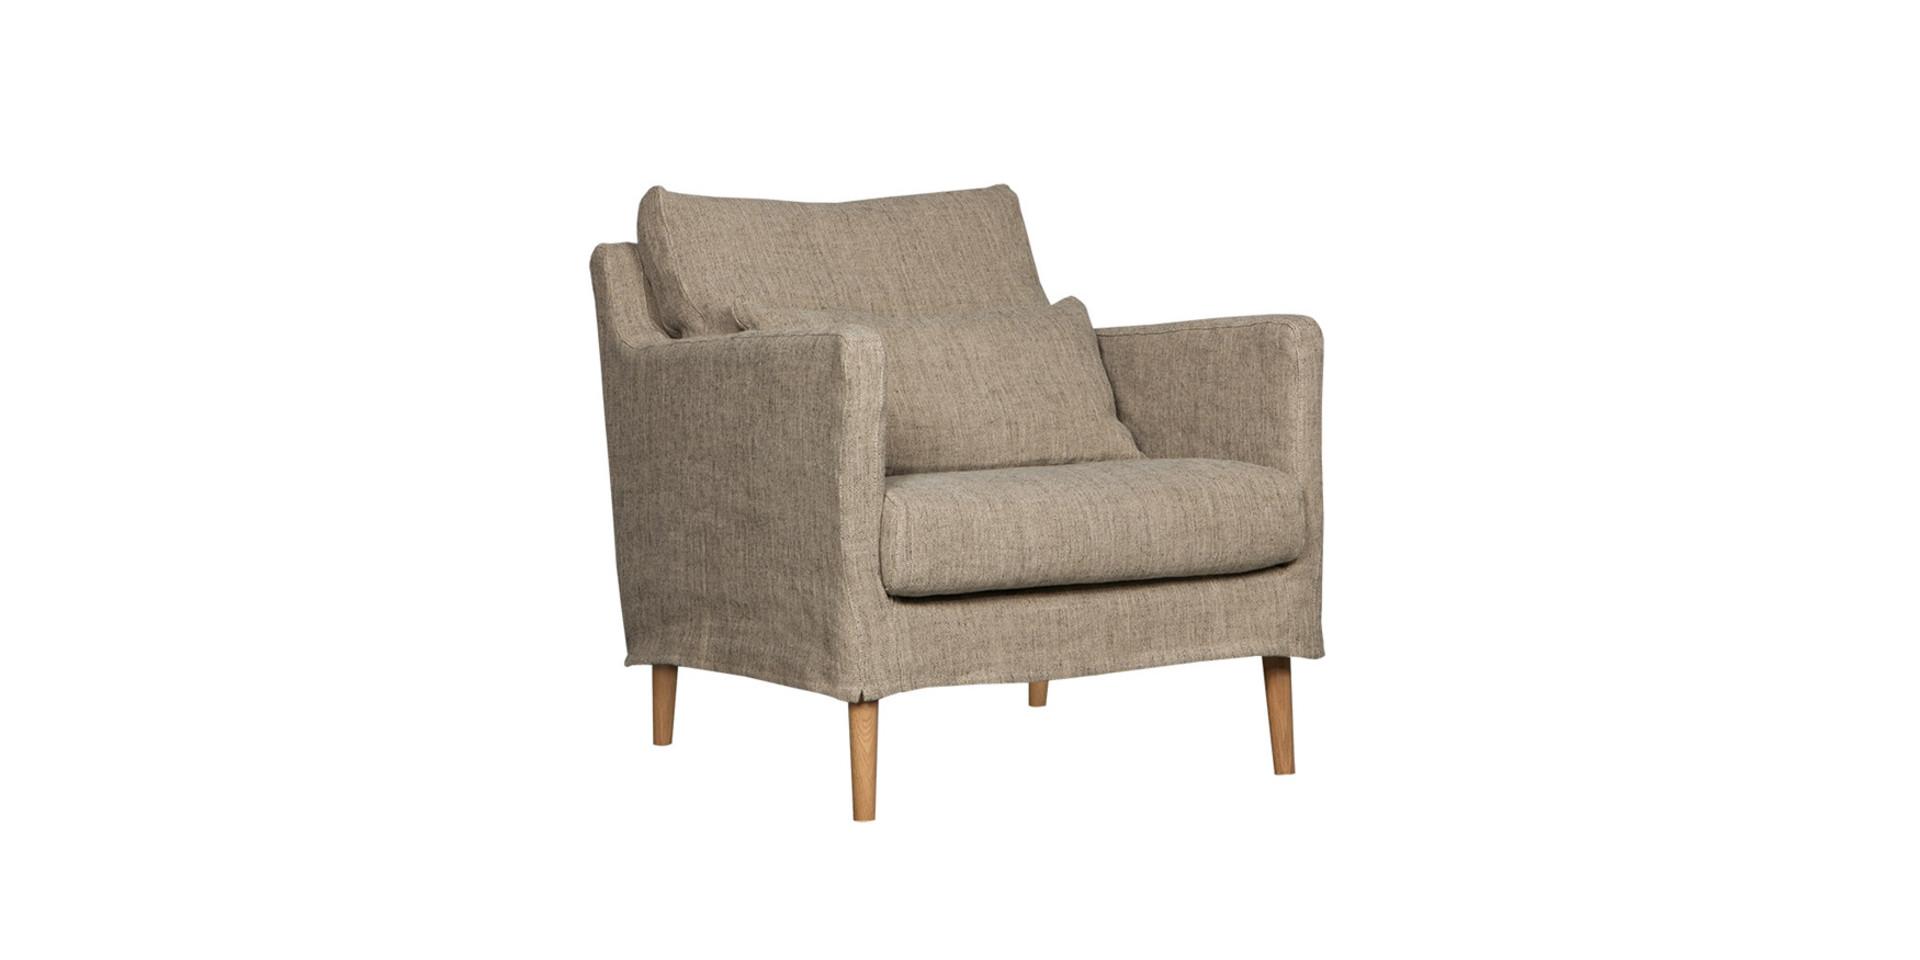 lena_armchair_linenl616_006_grain_2